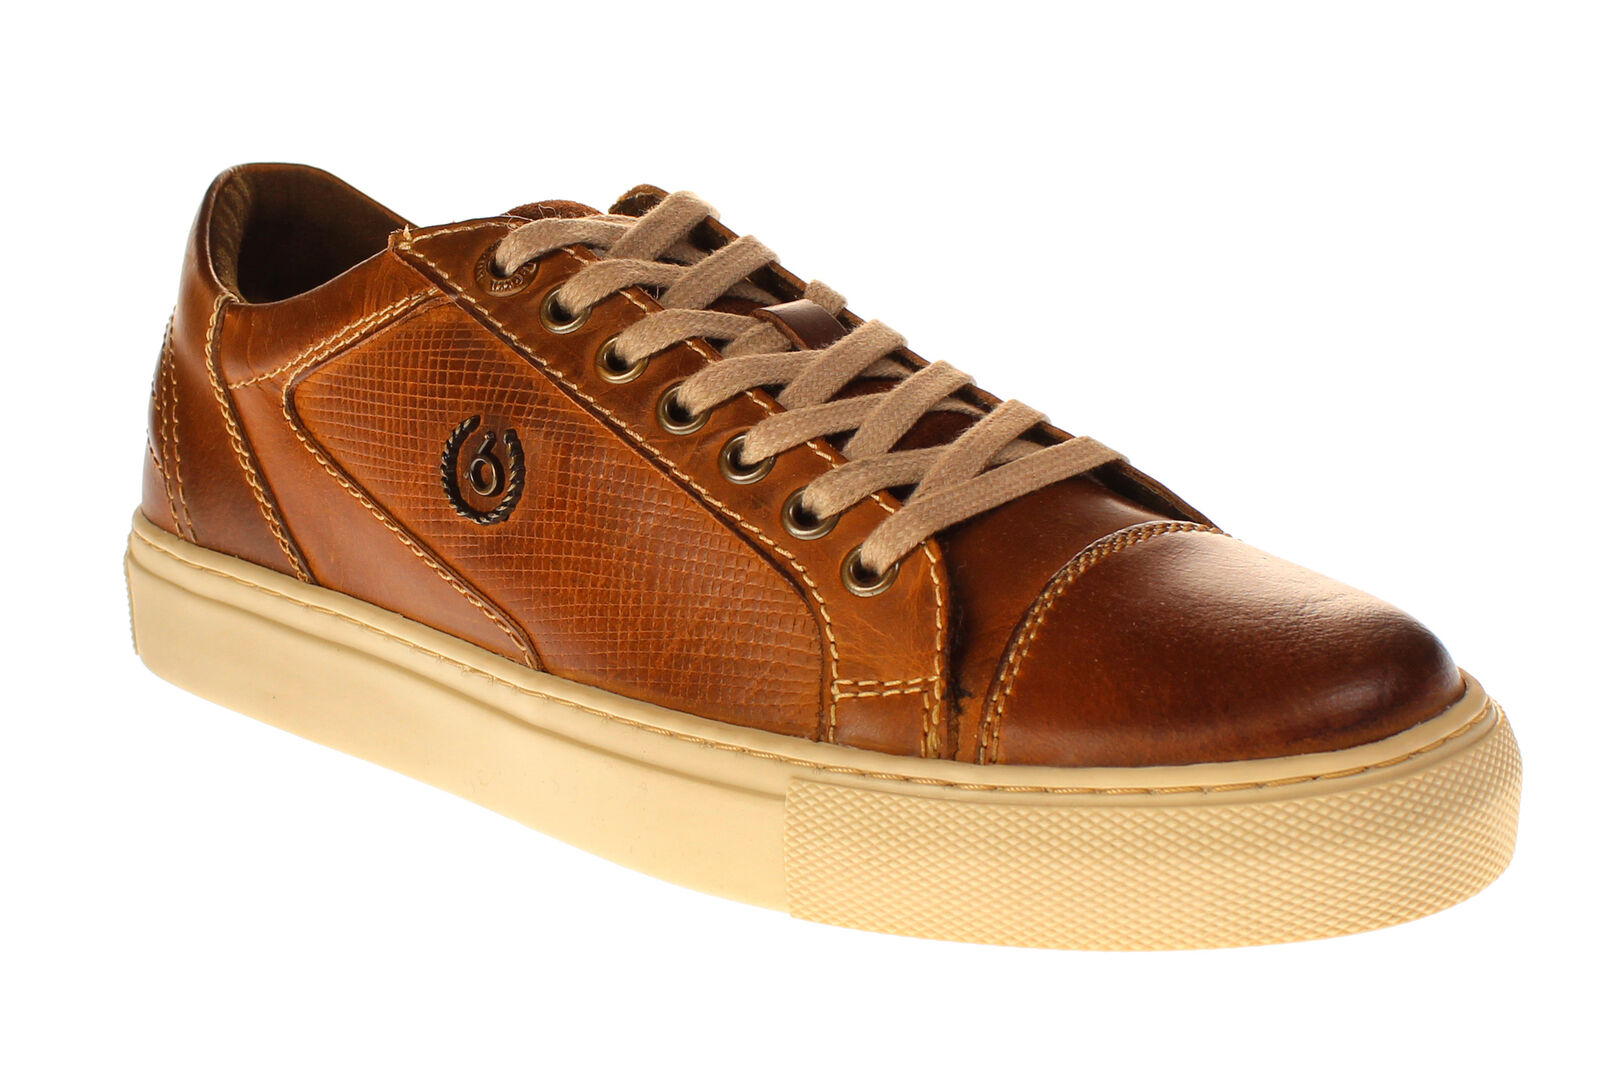 bugatti AUSTRAL 322-40502-1200 - Herren Schuhe Sneaker - 6300-cognac